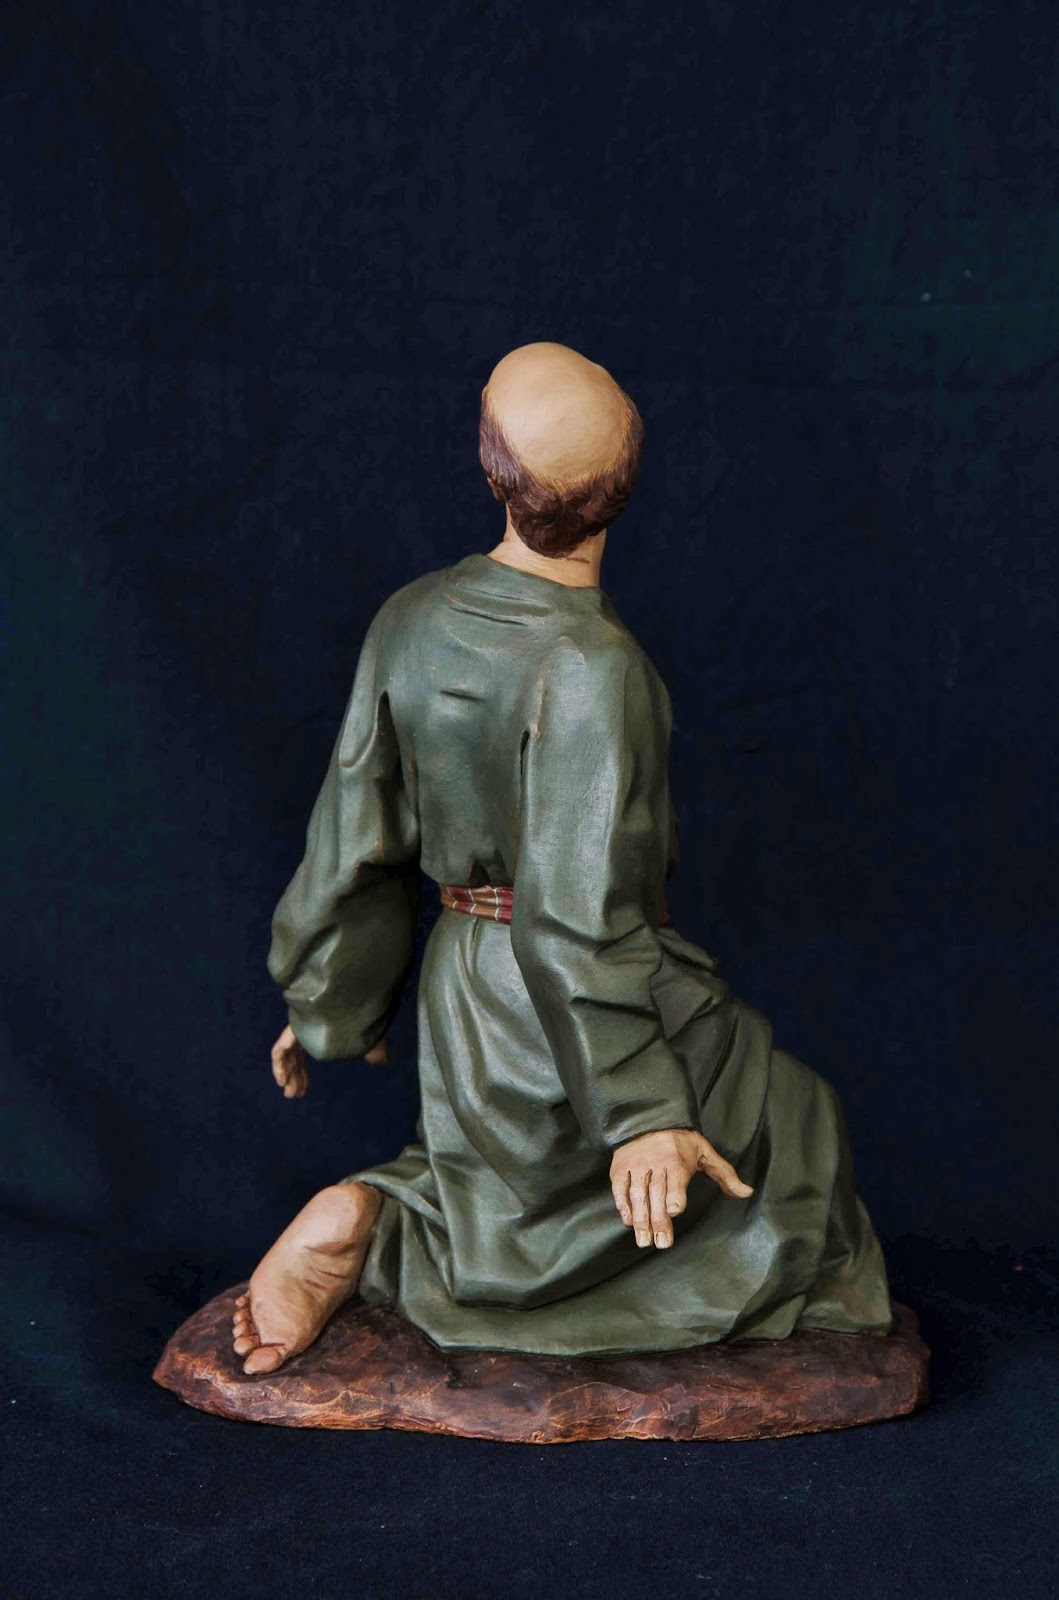 Belén presepe nativity krippe Arturo Serra escultura barro cocido 20